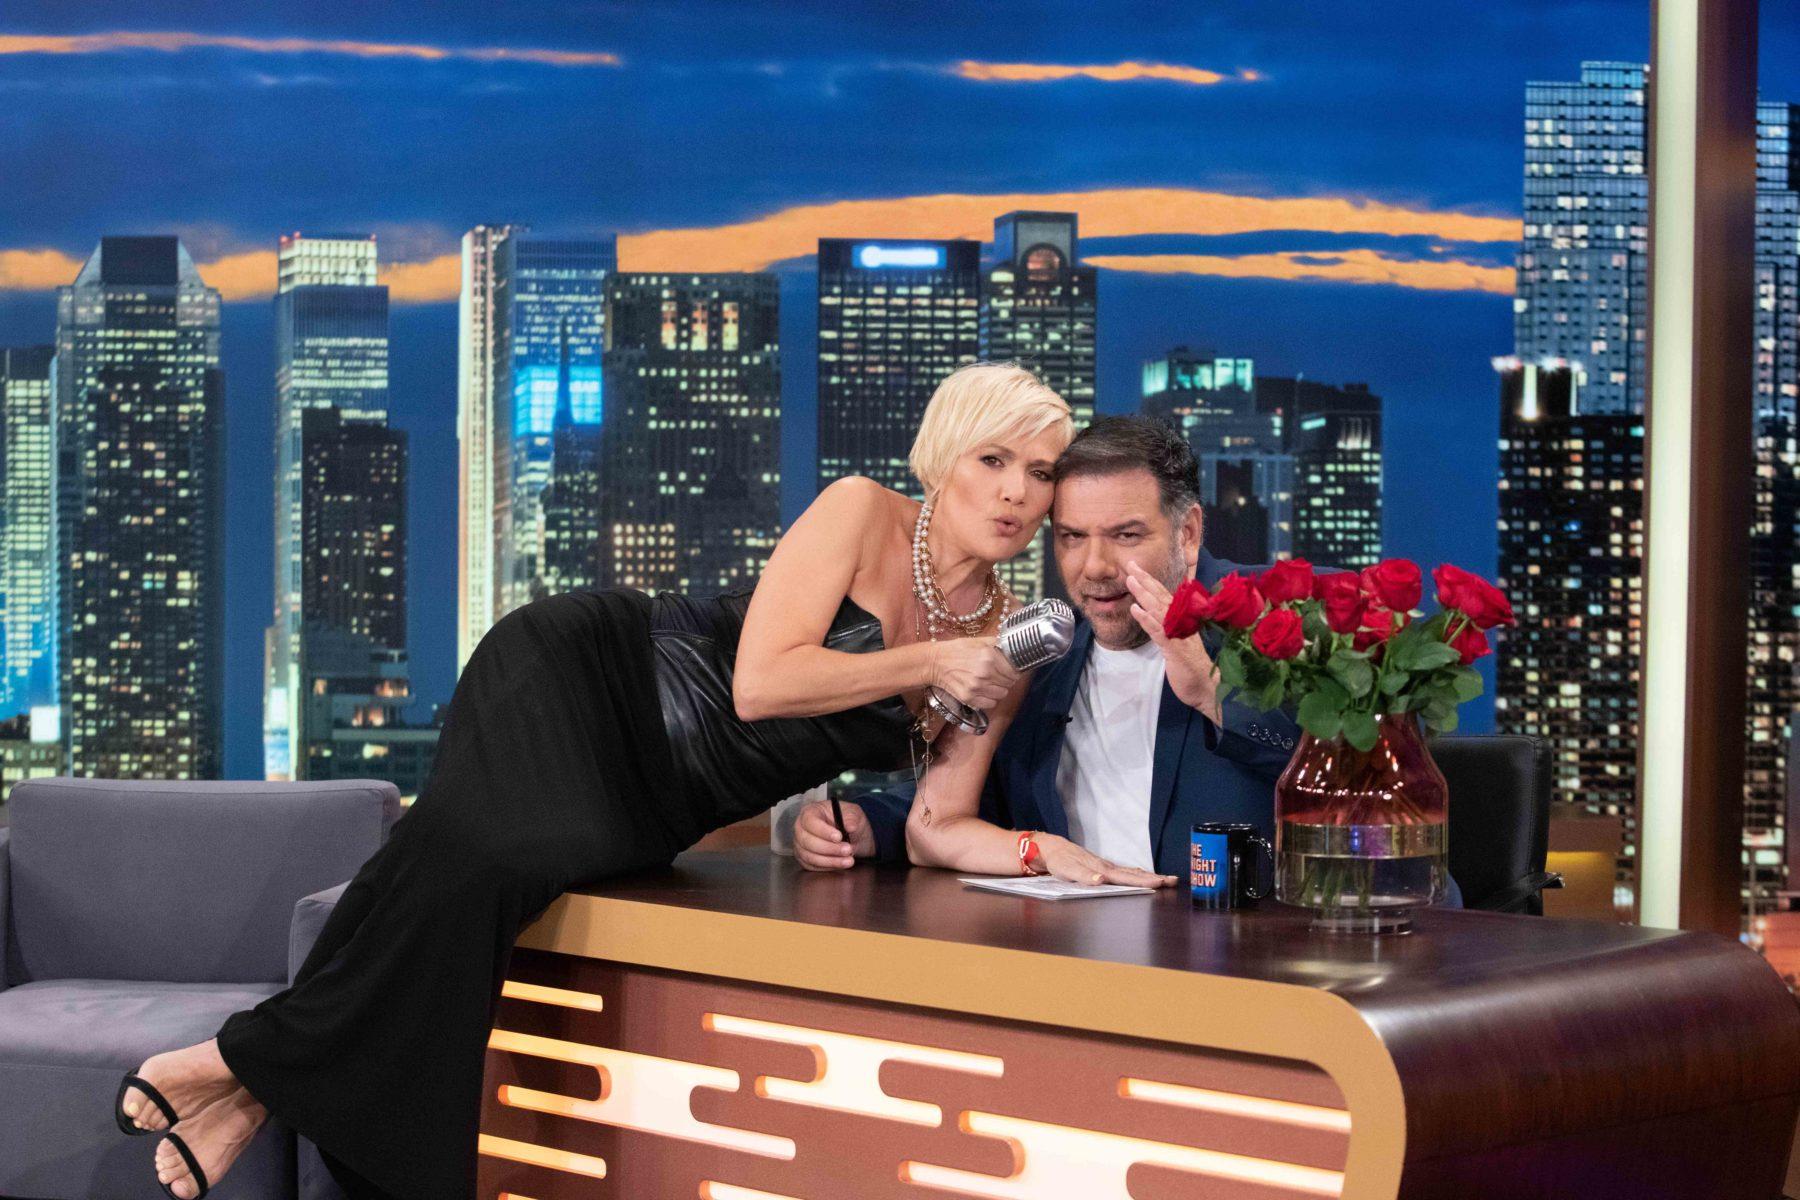 The 2 night show: 'Ηβη Αδάμου και Κωνσταντίνα Μιχαήλ οι απόψινές καλεσμένες του Γρηγόρη Αρναούτογλου